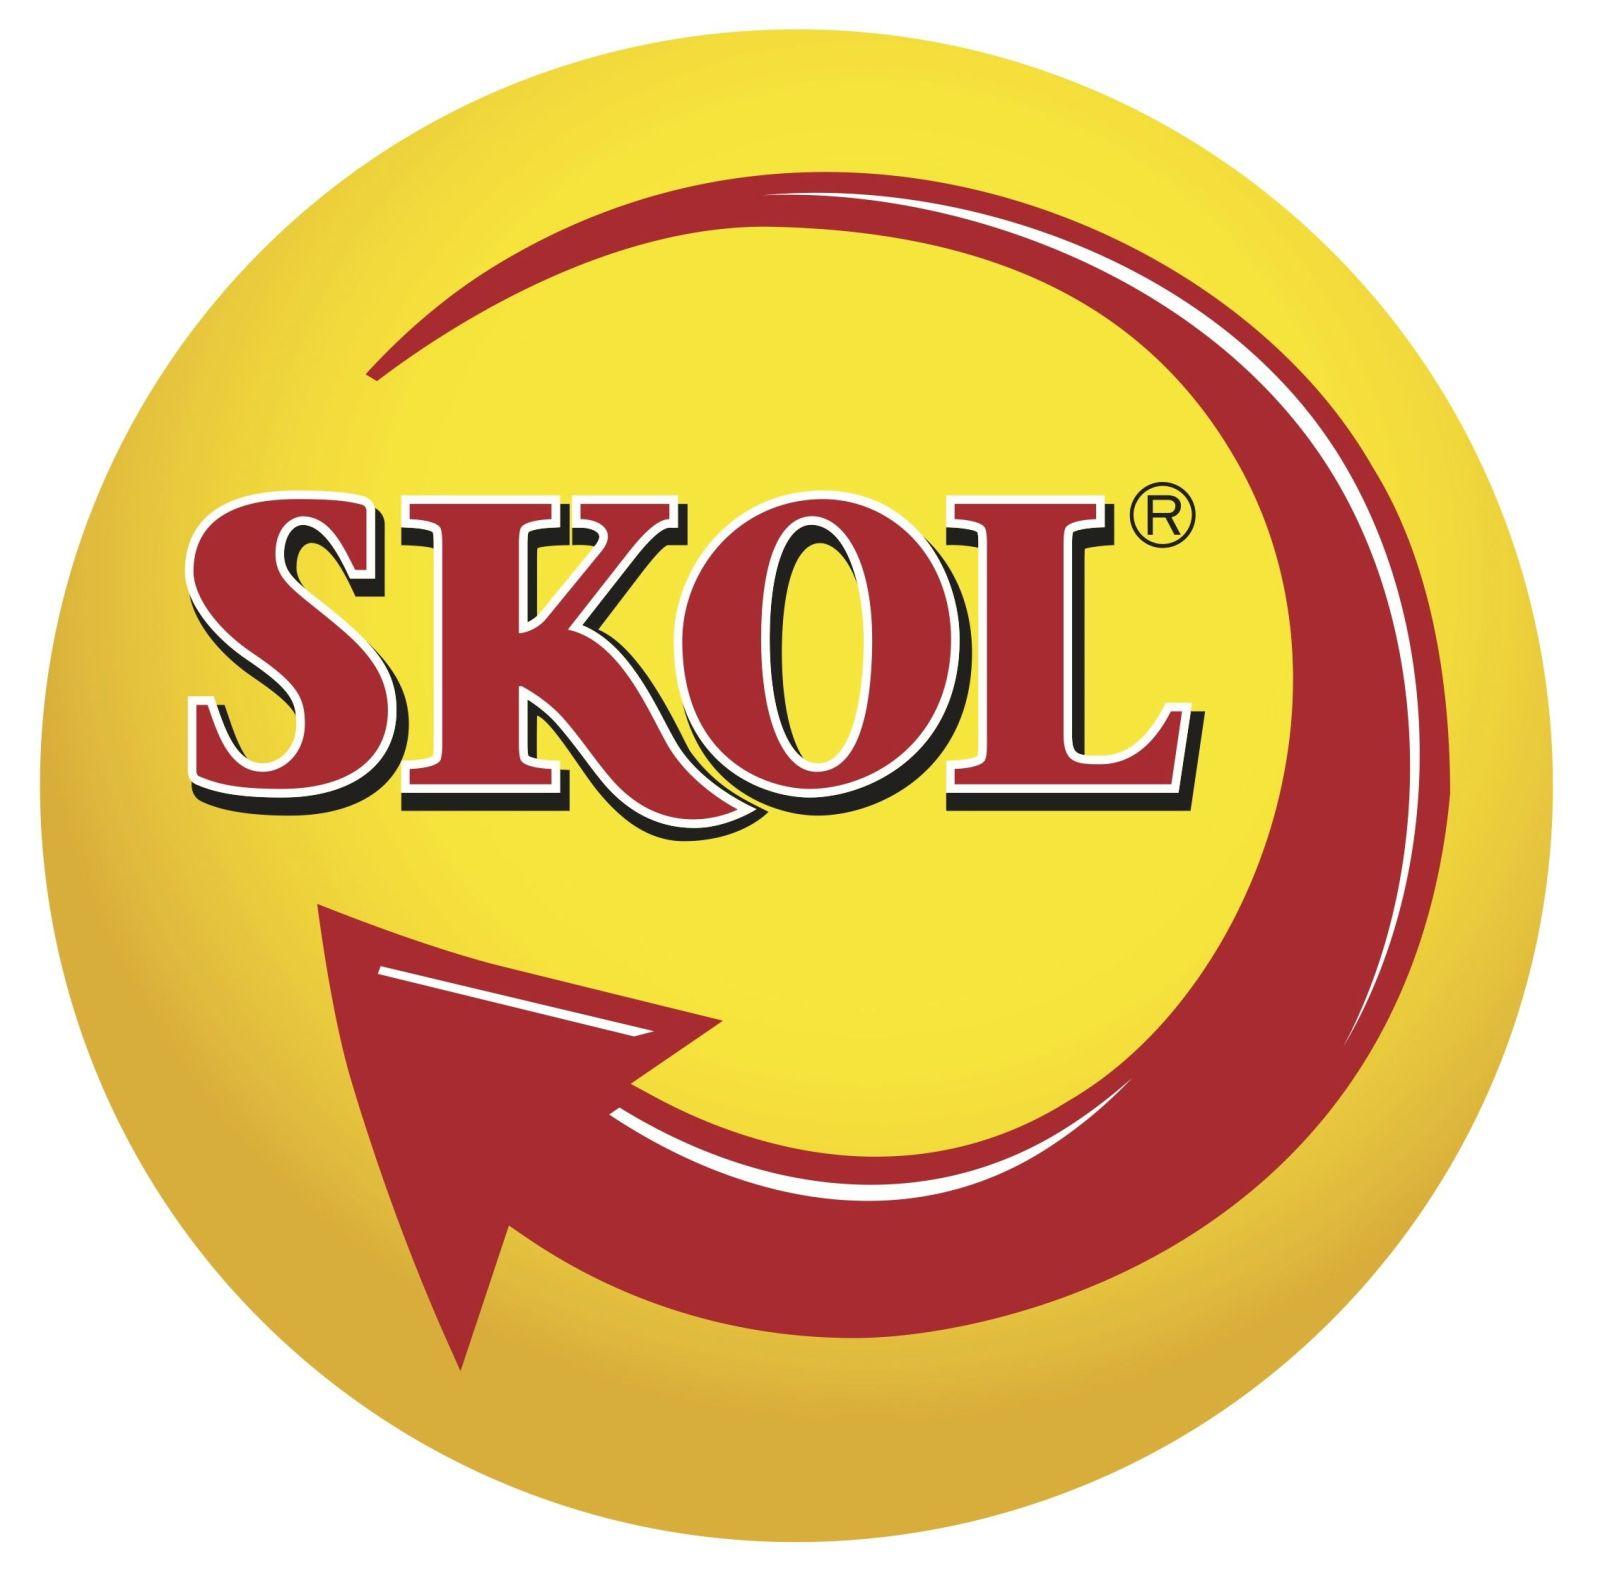 Logon Wallpaper Hd Skol Logo Logodownload Org Download De Logotipos